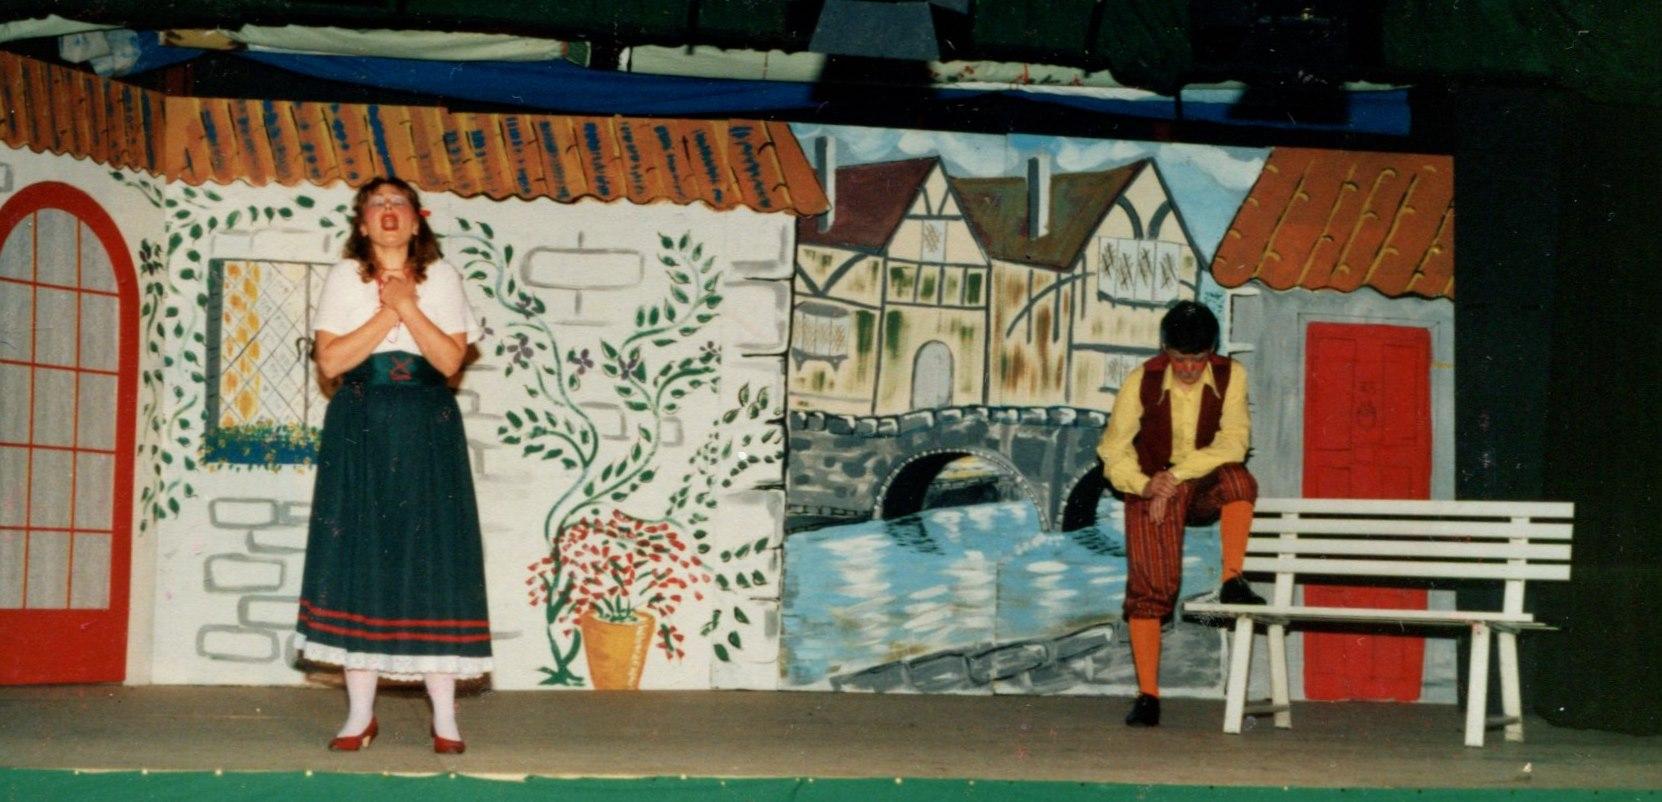 Hickory Dickory Dock, 1986 (www.lmvg.ie) (55)